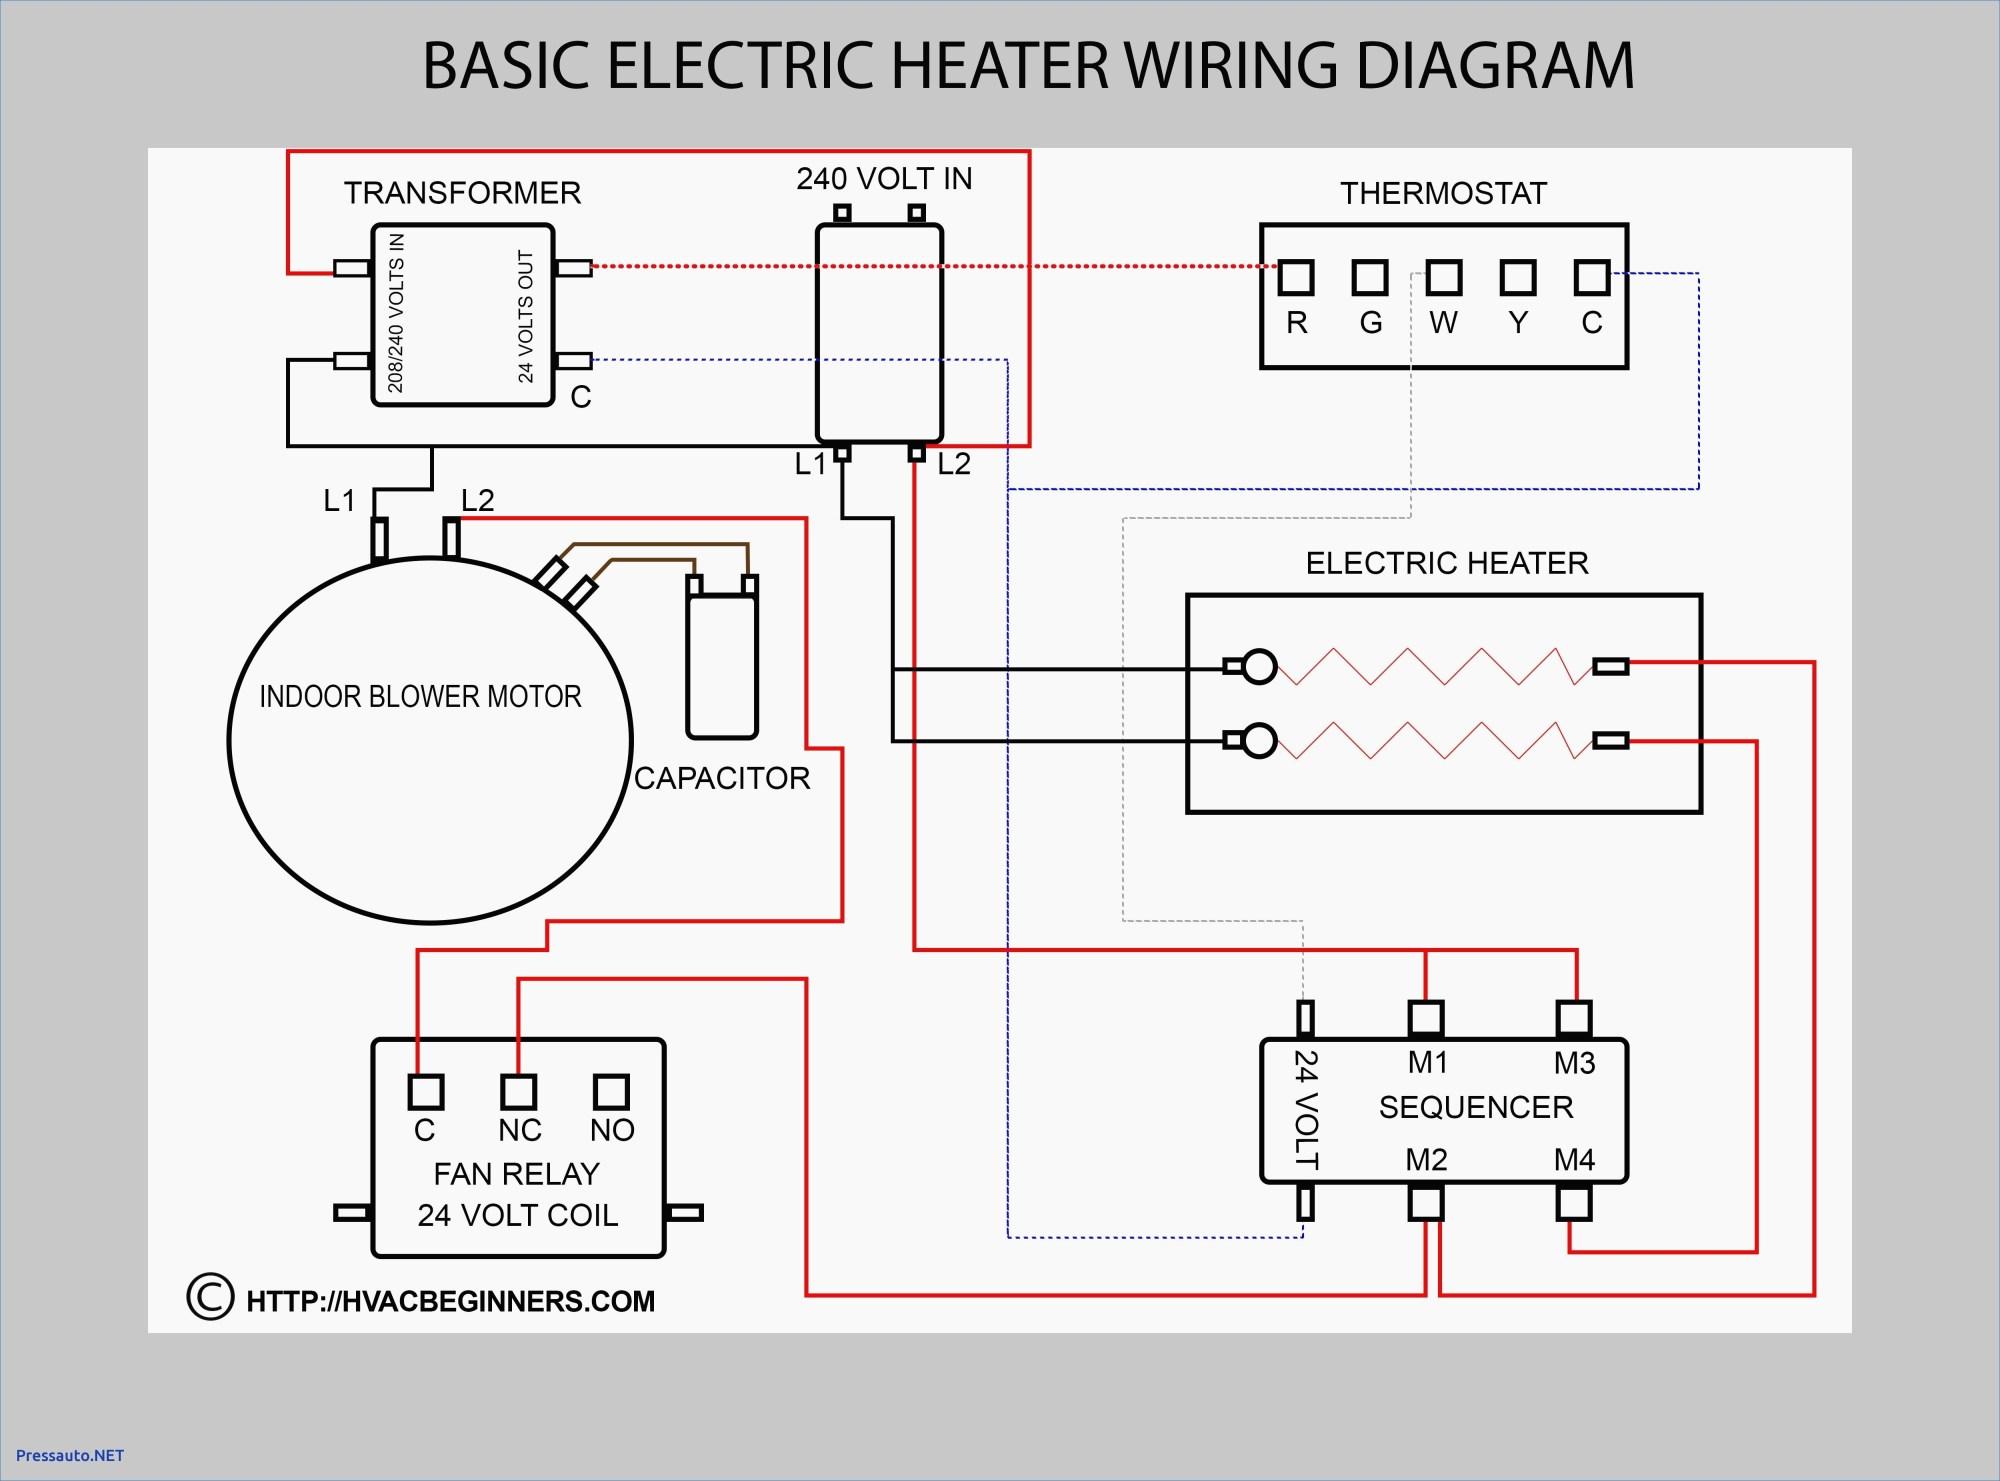 hight resolution of goodman heat pump wiring diagram goodman heat pump thermostat wiring diagram elegant troubleshooting manual free